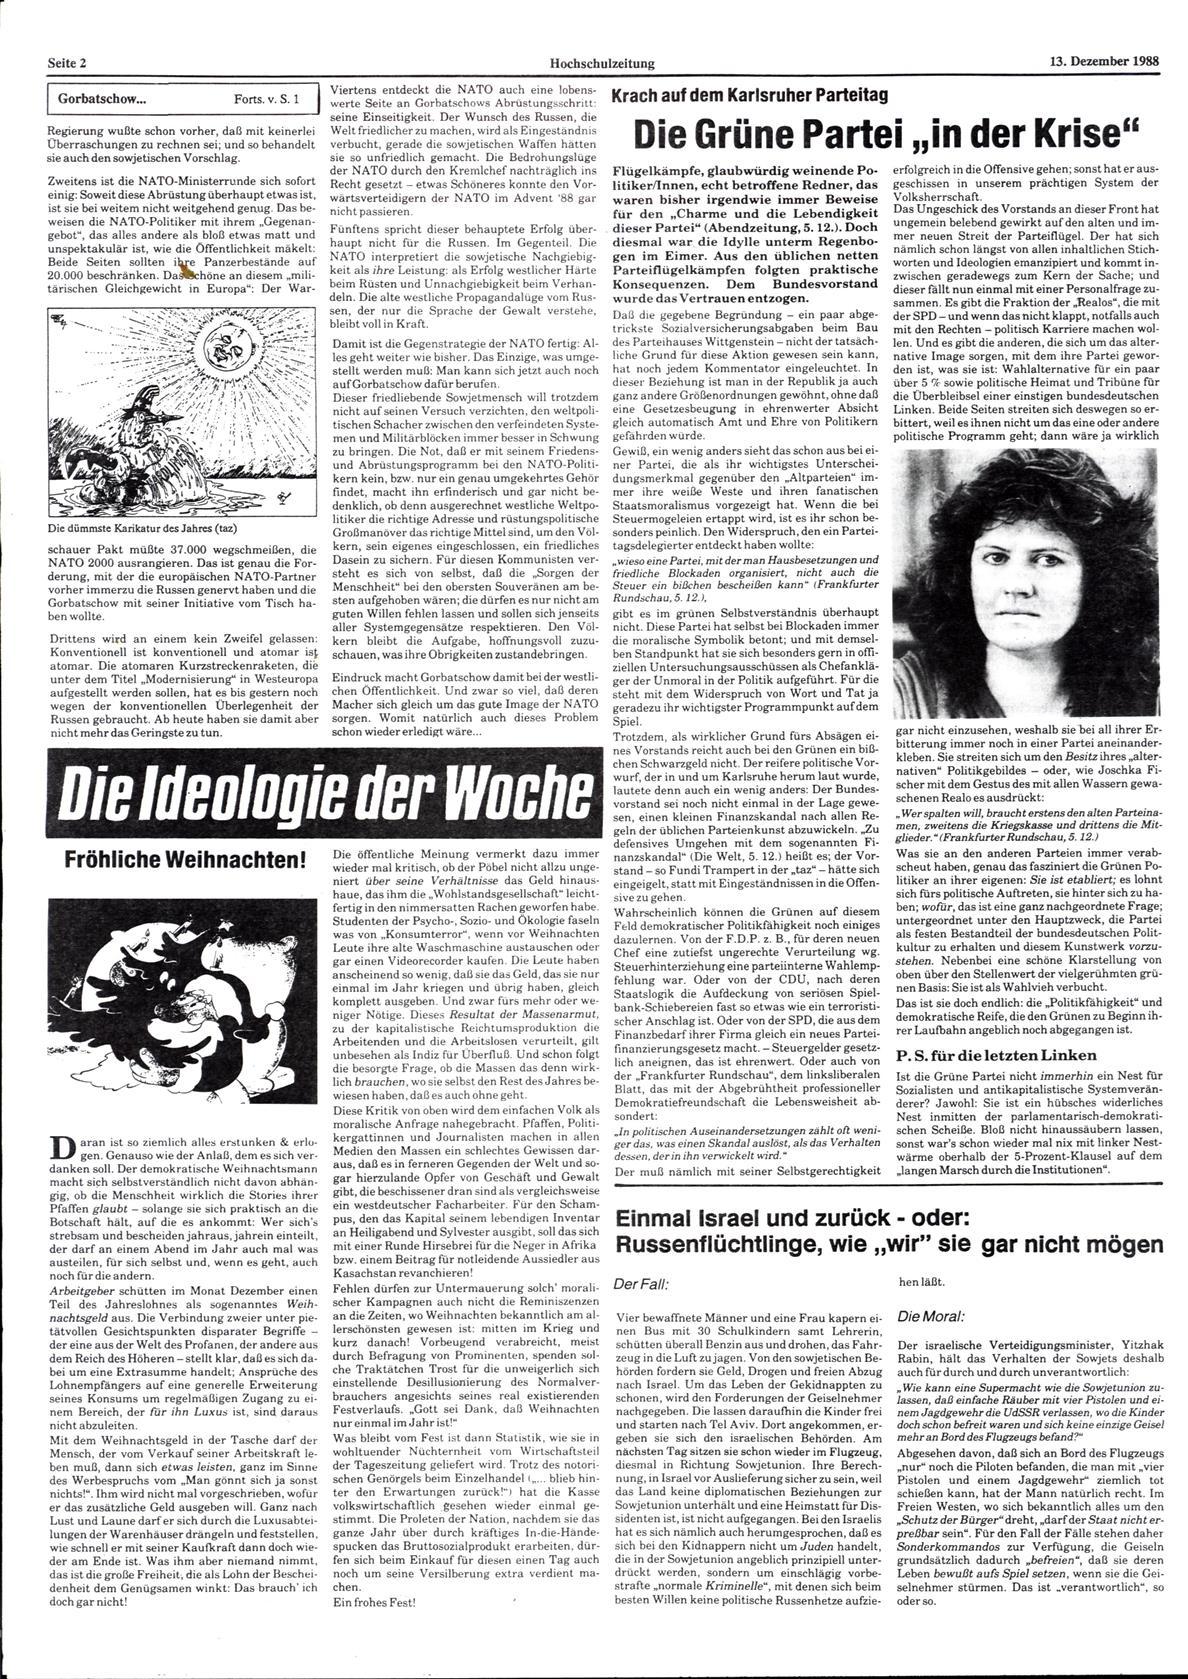 Bochum_BHZ_19881213_183_002